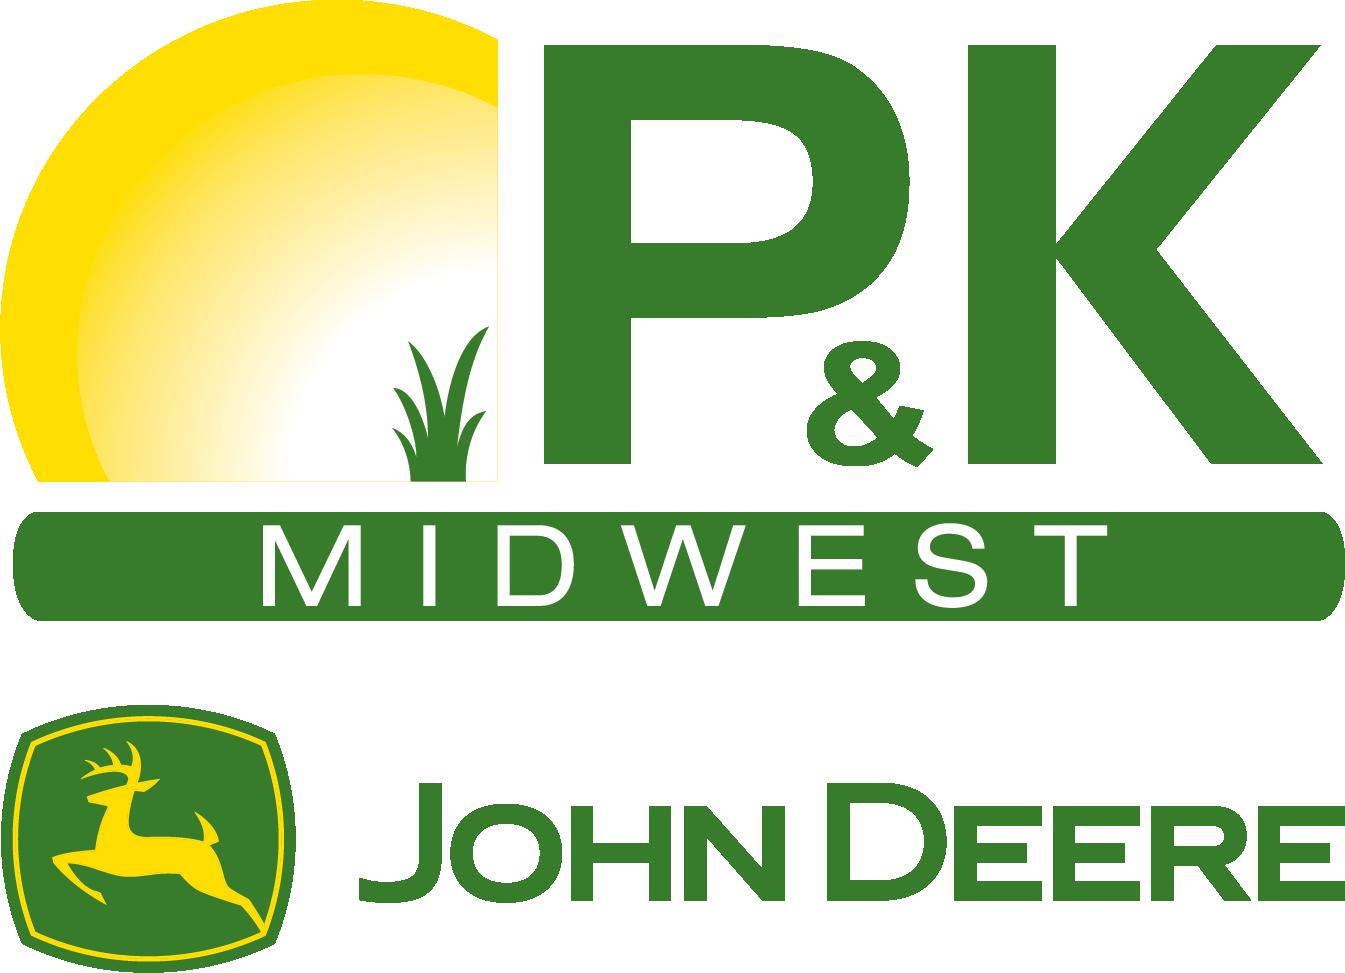 P&K Midwest John Deere